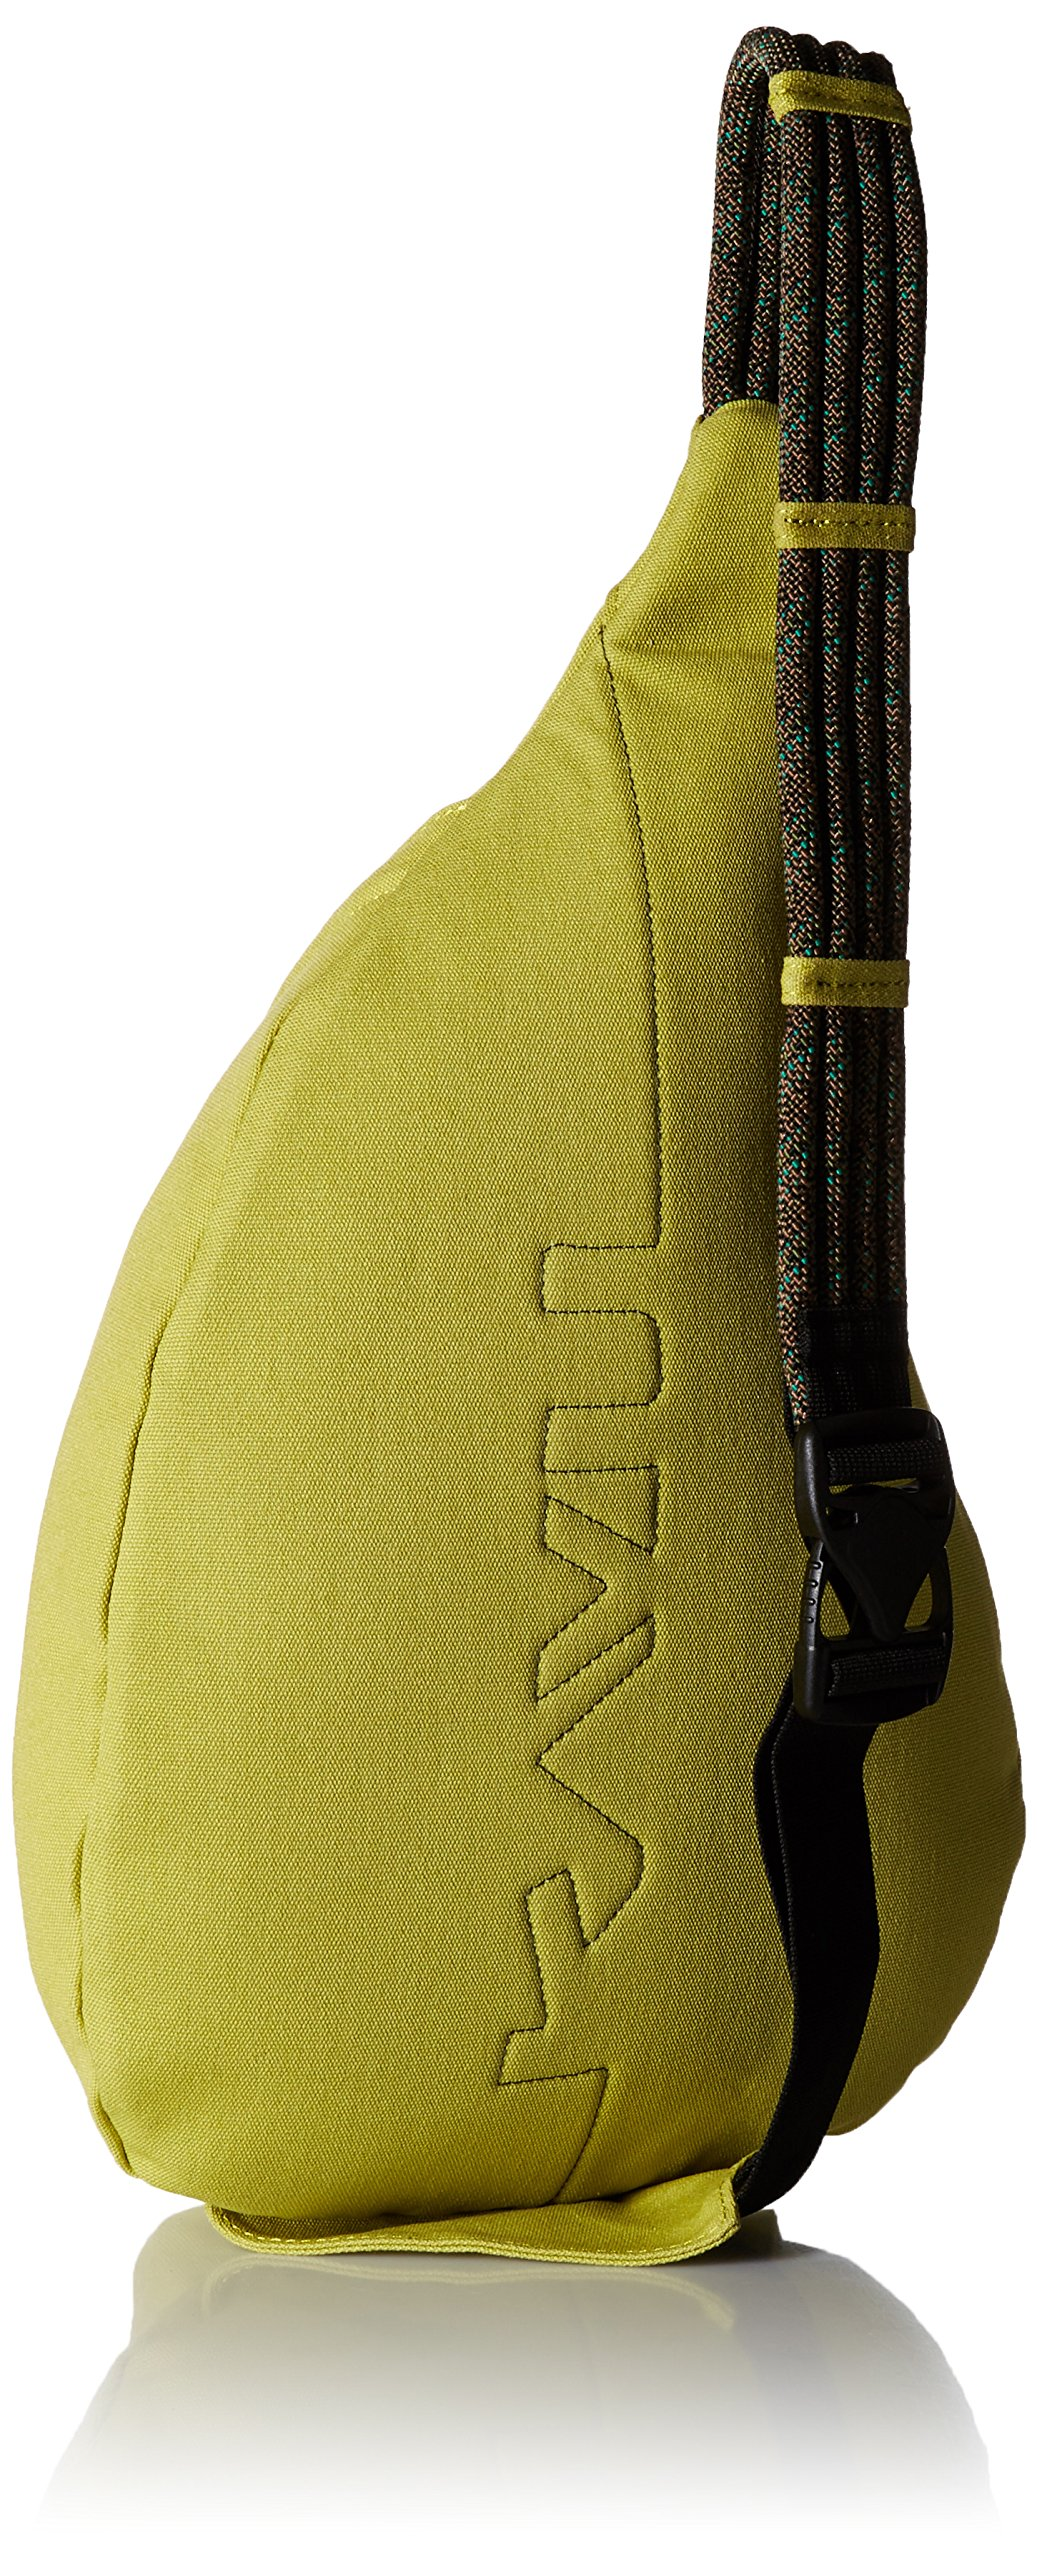 KAVU Rope Bag, Acid Green, One Size by KAVU (Image #2)